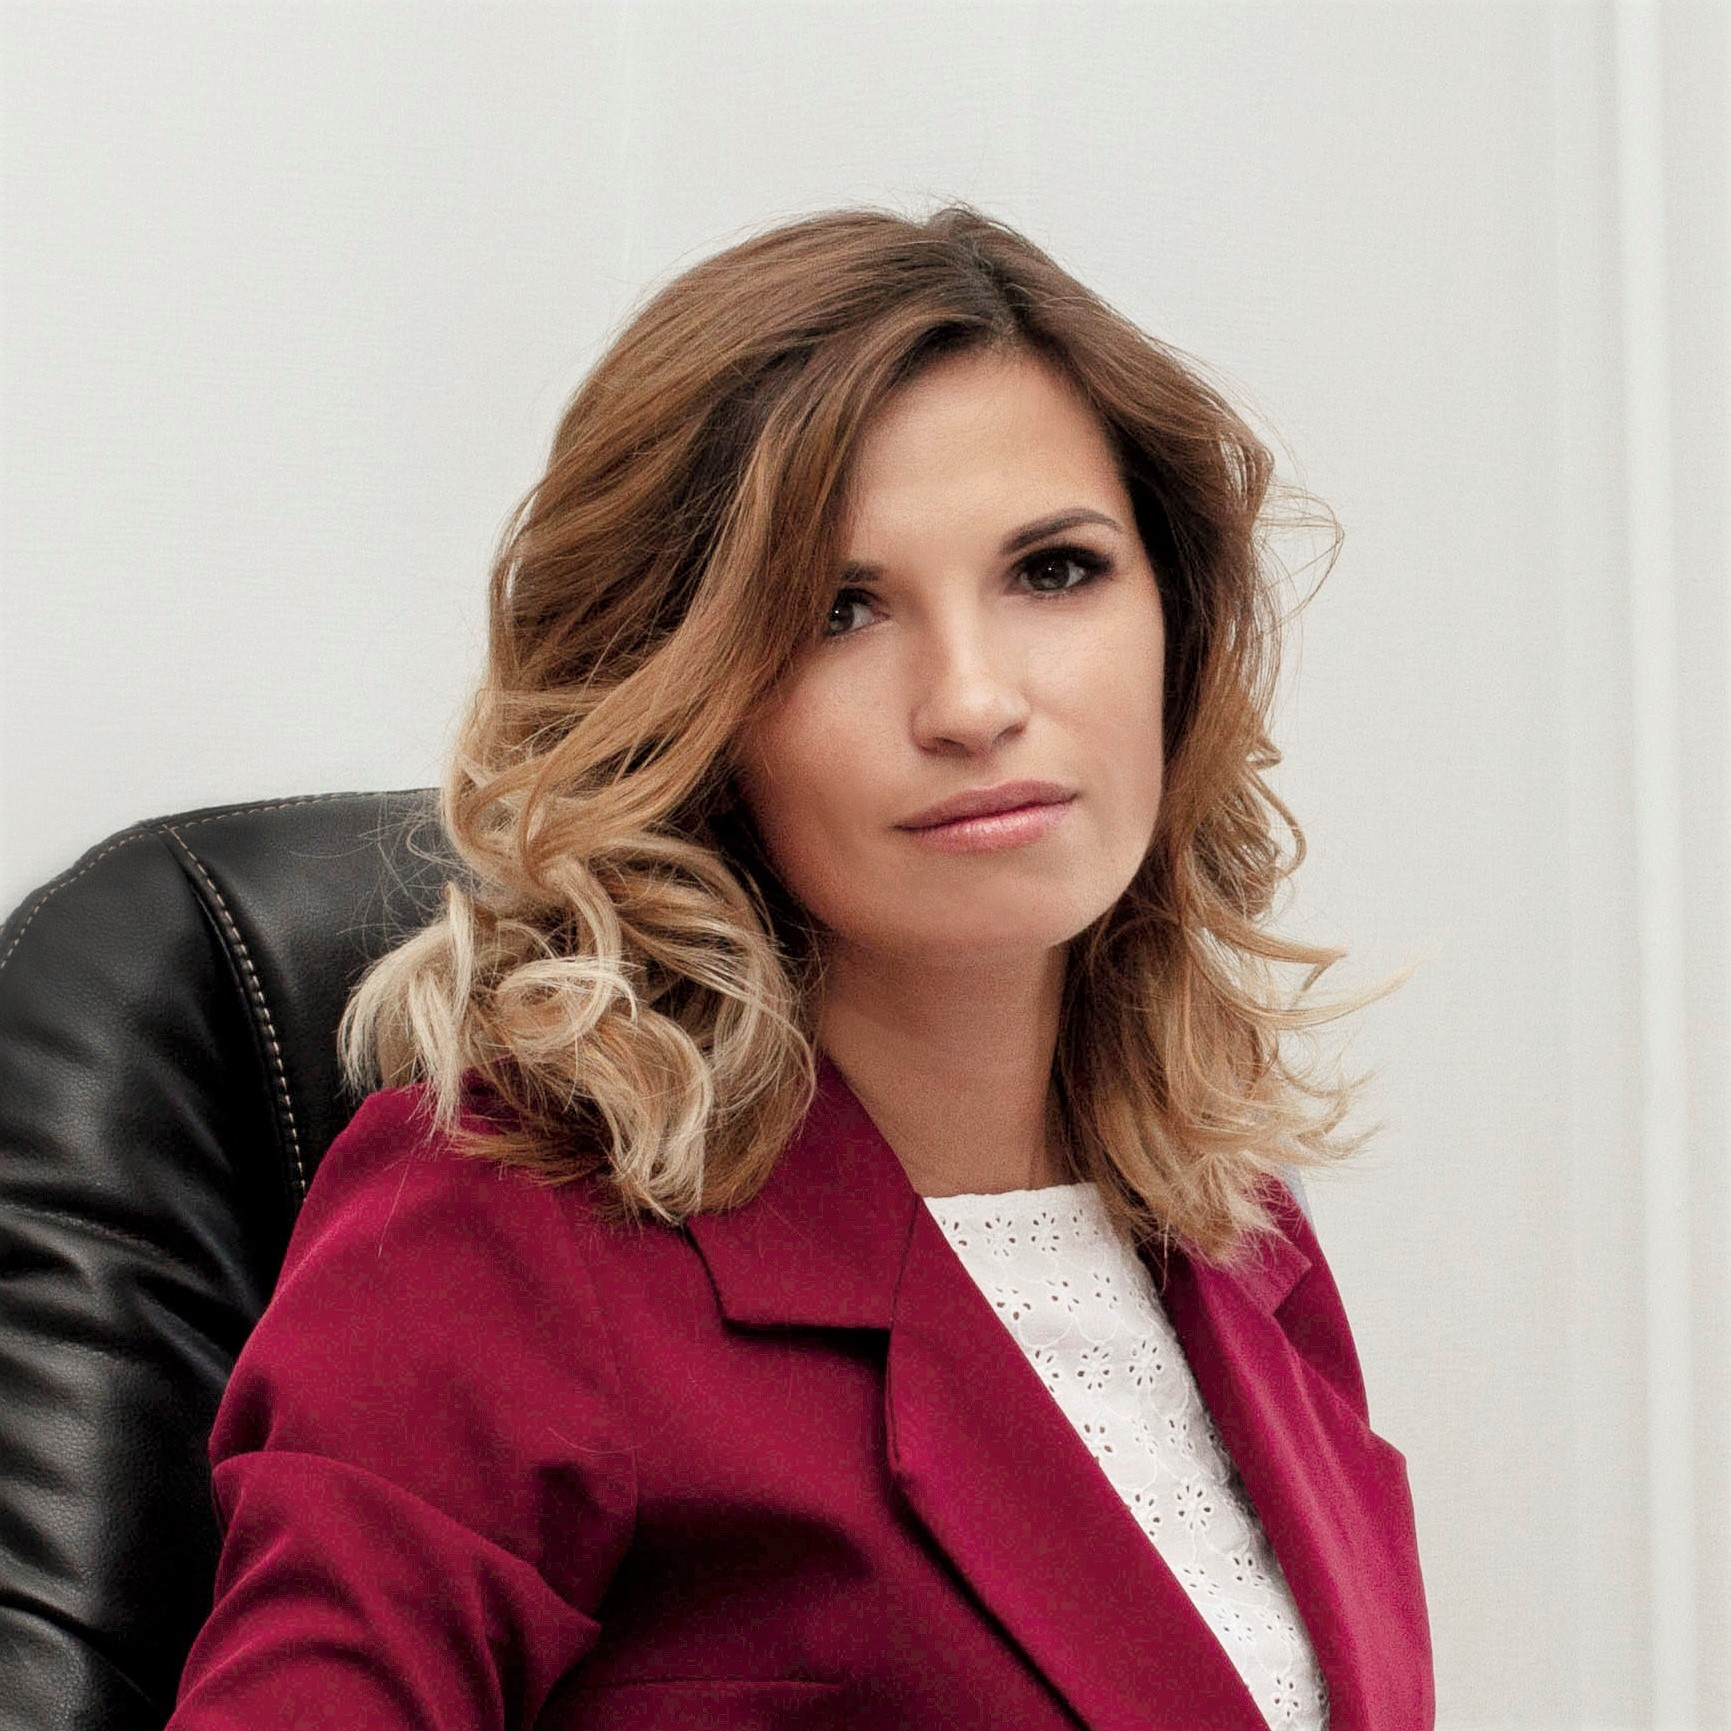 Нина Лапшина